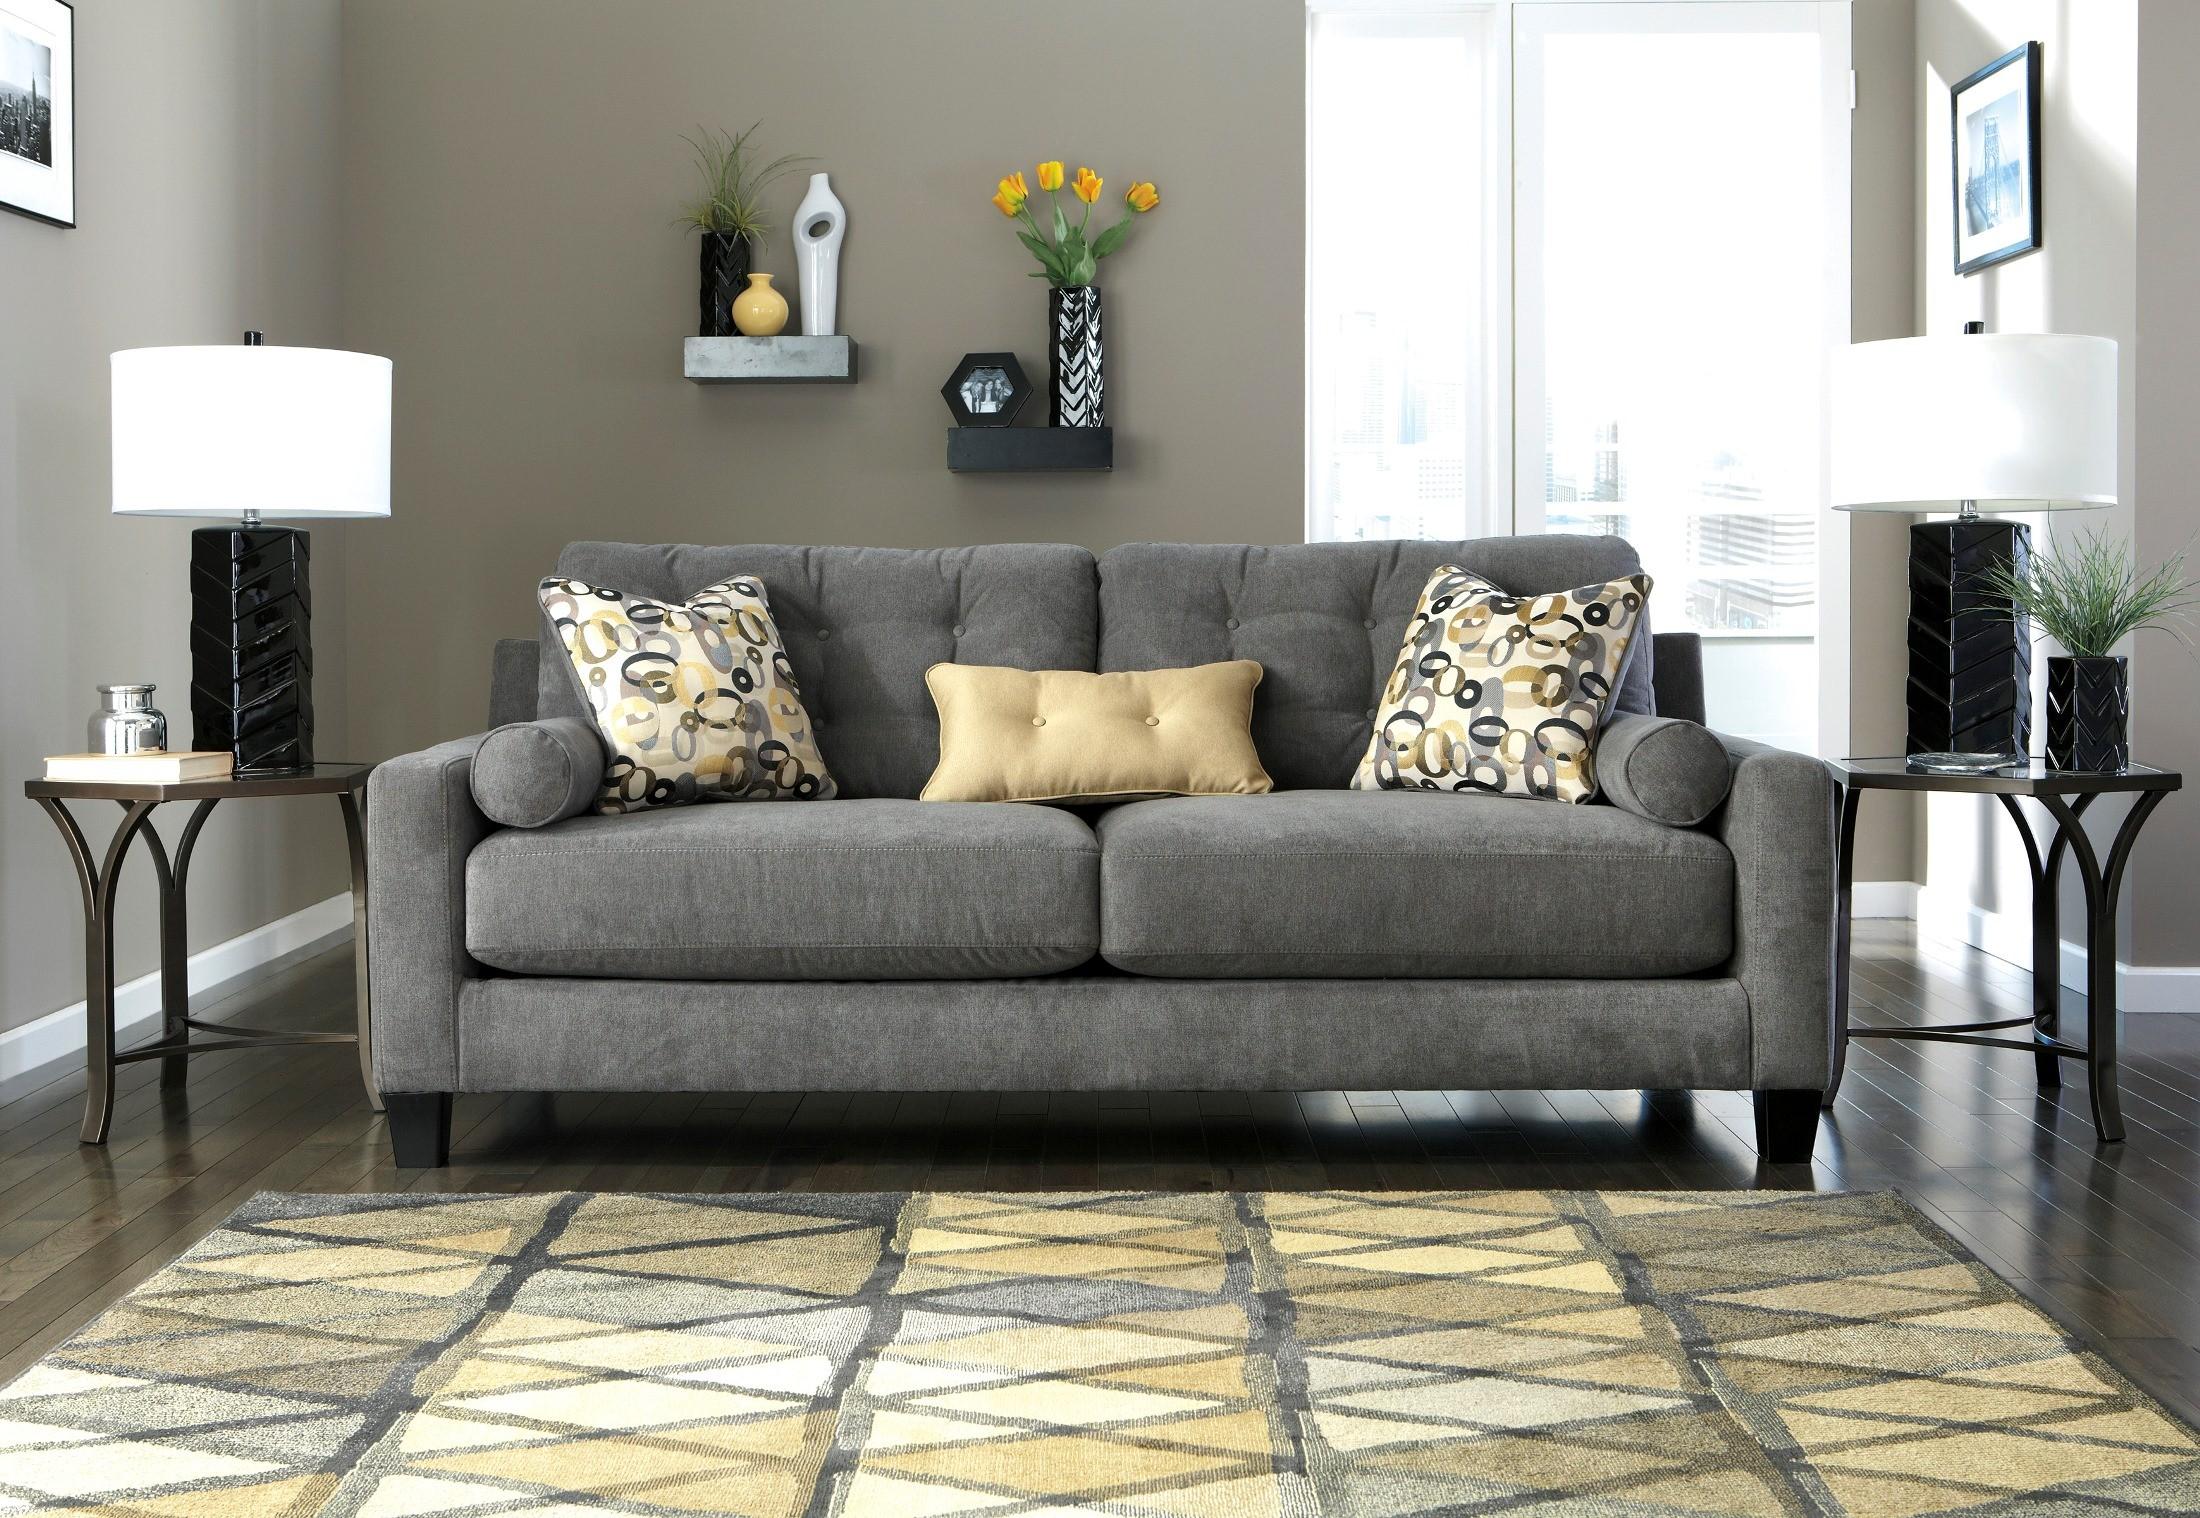 Mallbern charcoal living room set 97003 38 35 ashley for Charcoal living room furniture